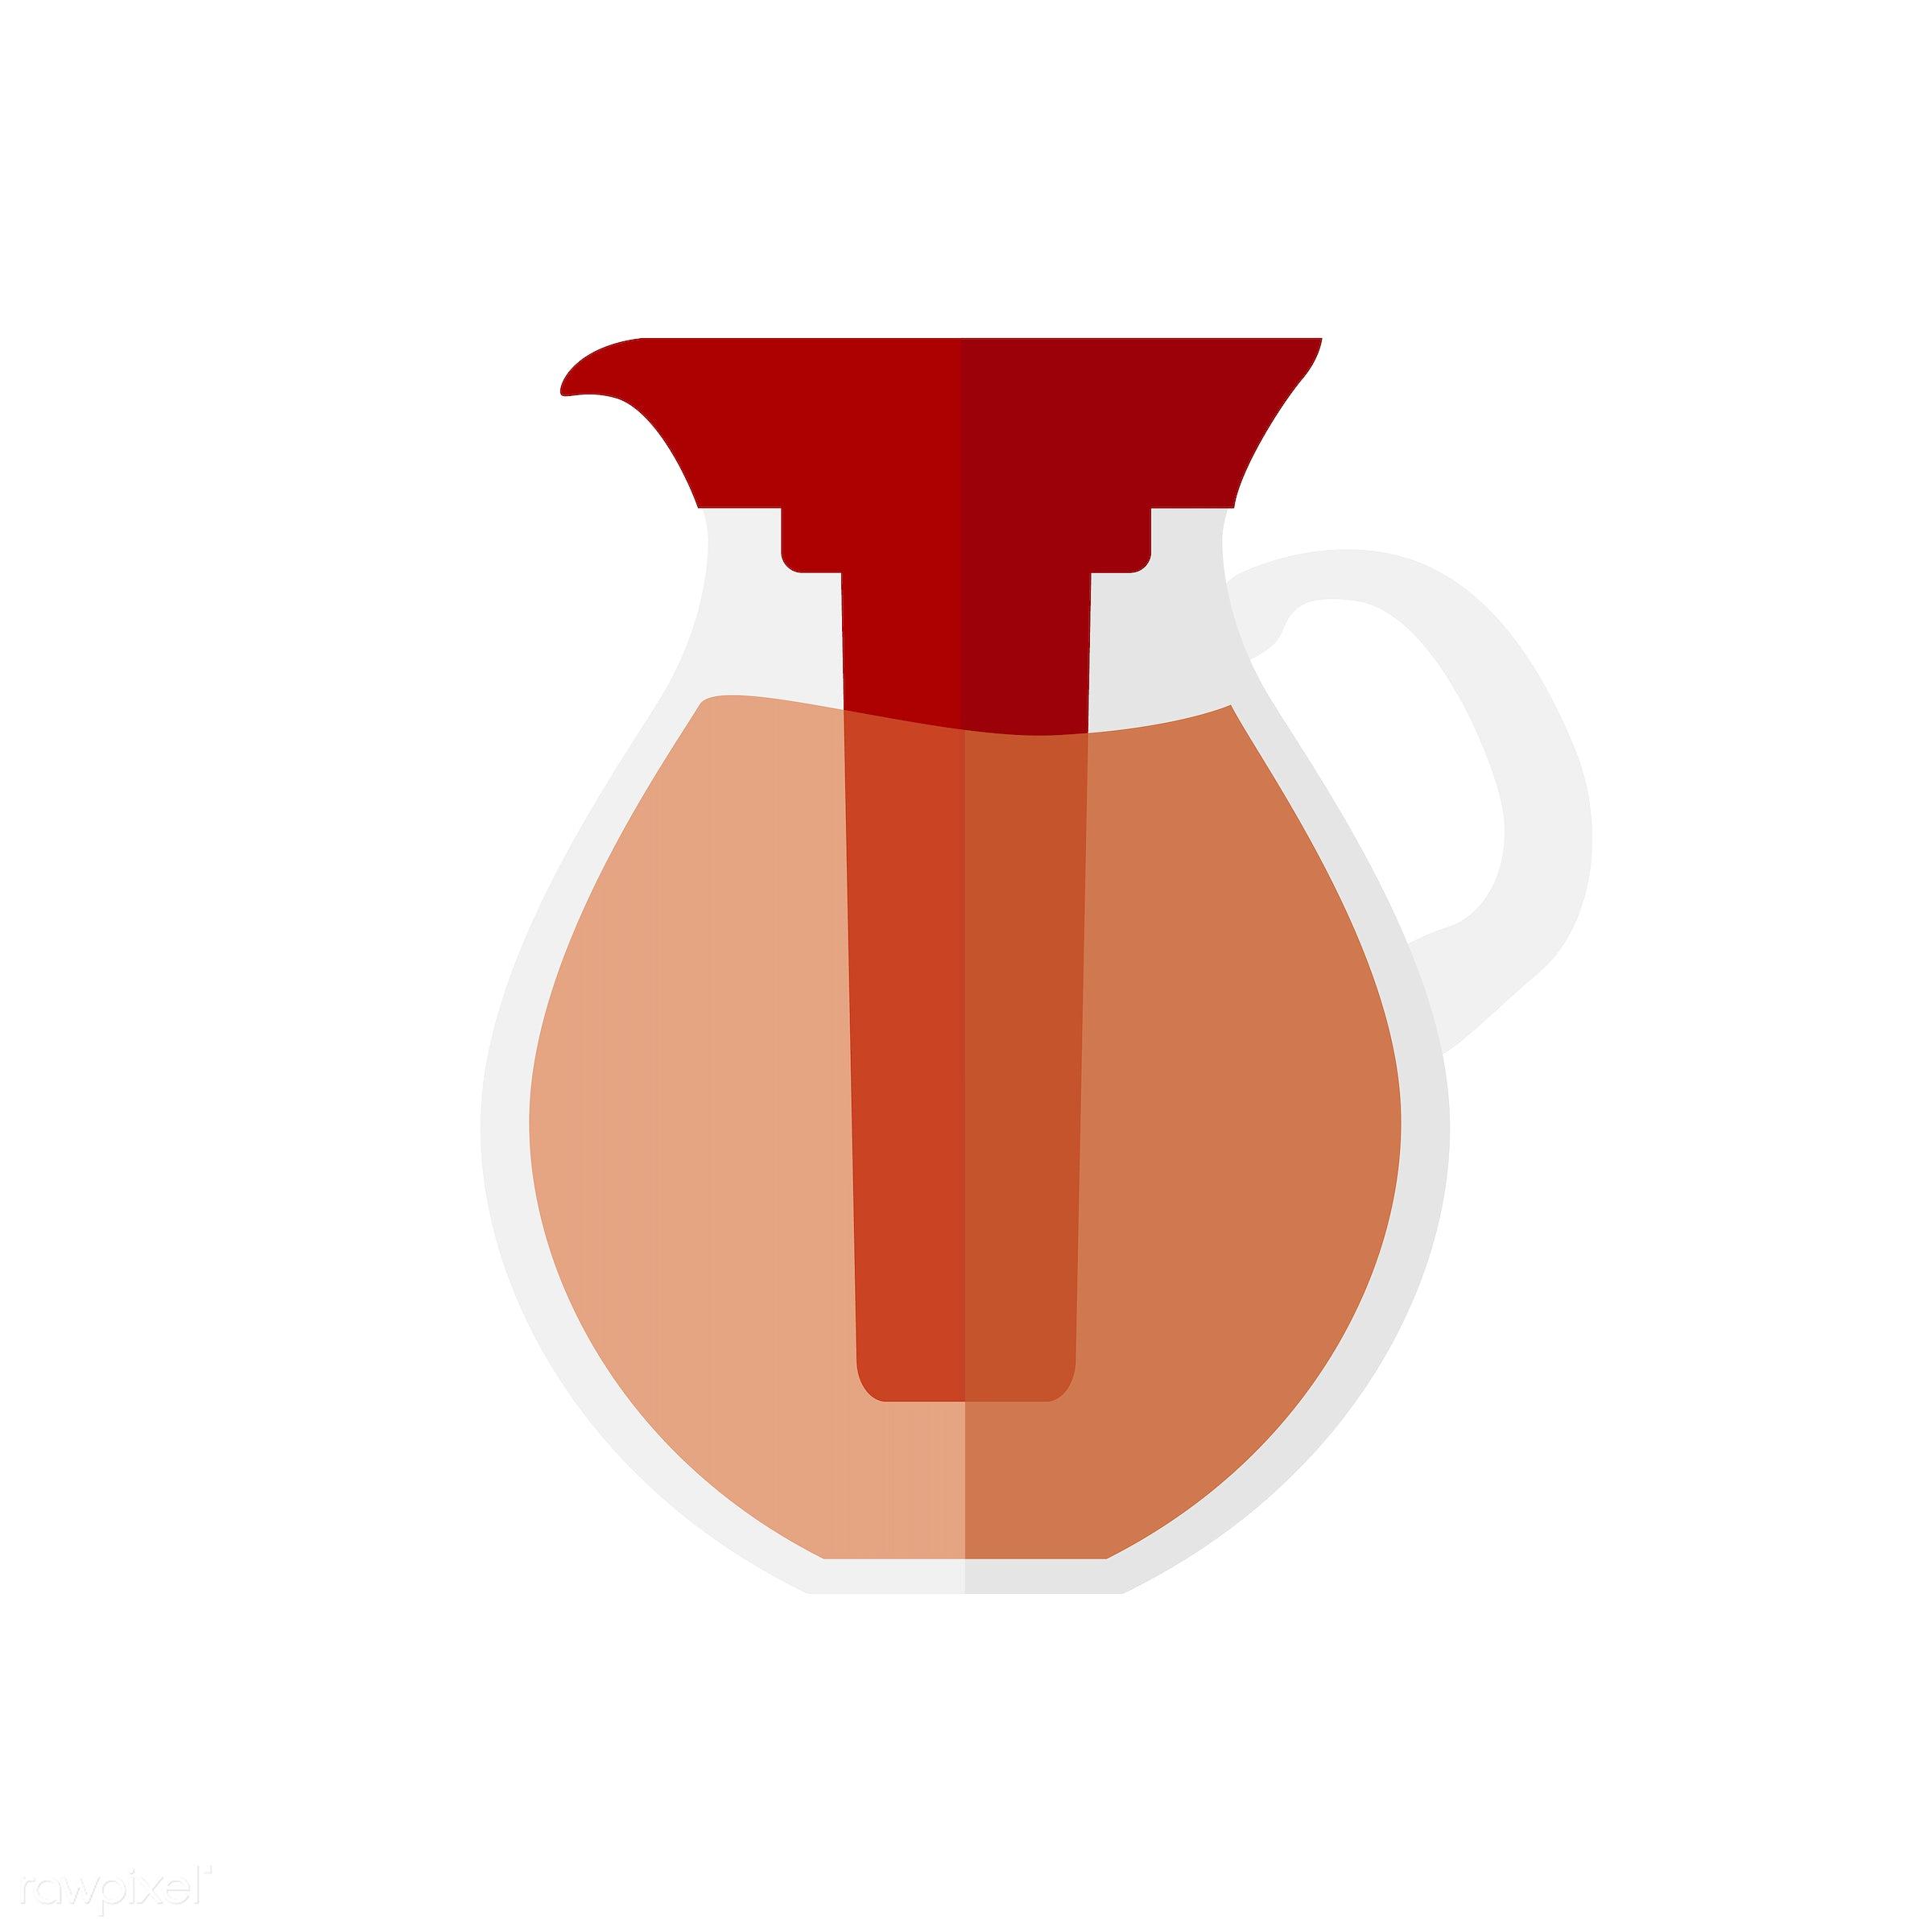 vector, graphic, illustration, icon, symbol, colorful, cute, drink, beverage, water, tea, tea pot, hot drink, orange